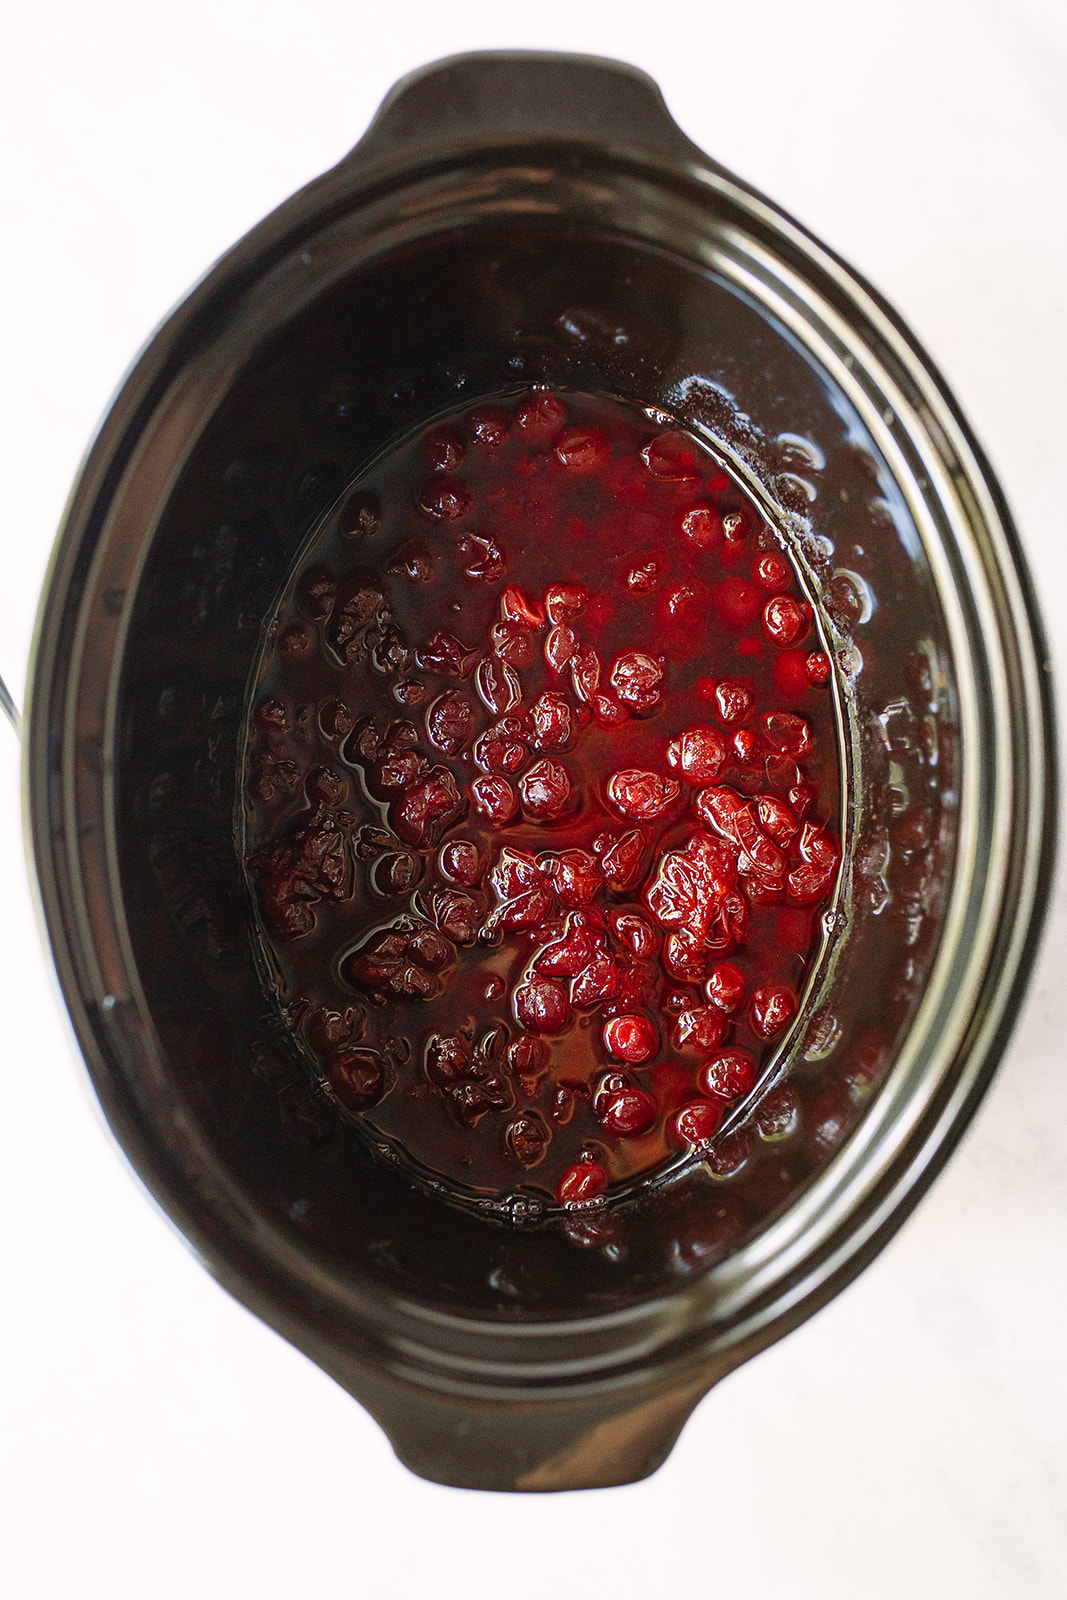 Crockpot Cranberry Sauce with Bourbon